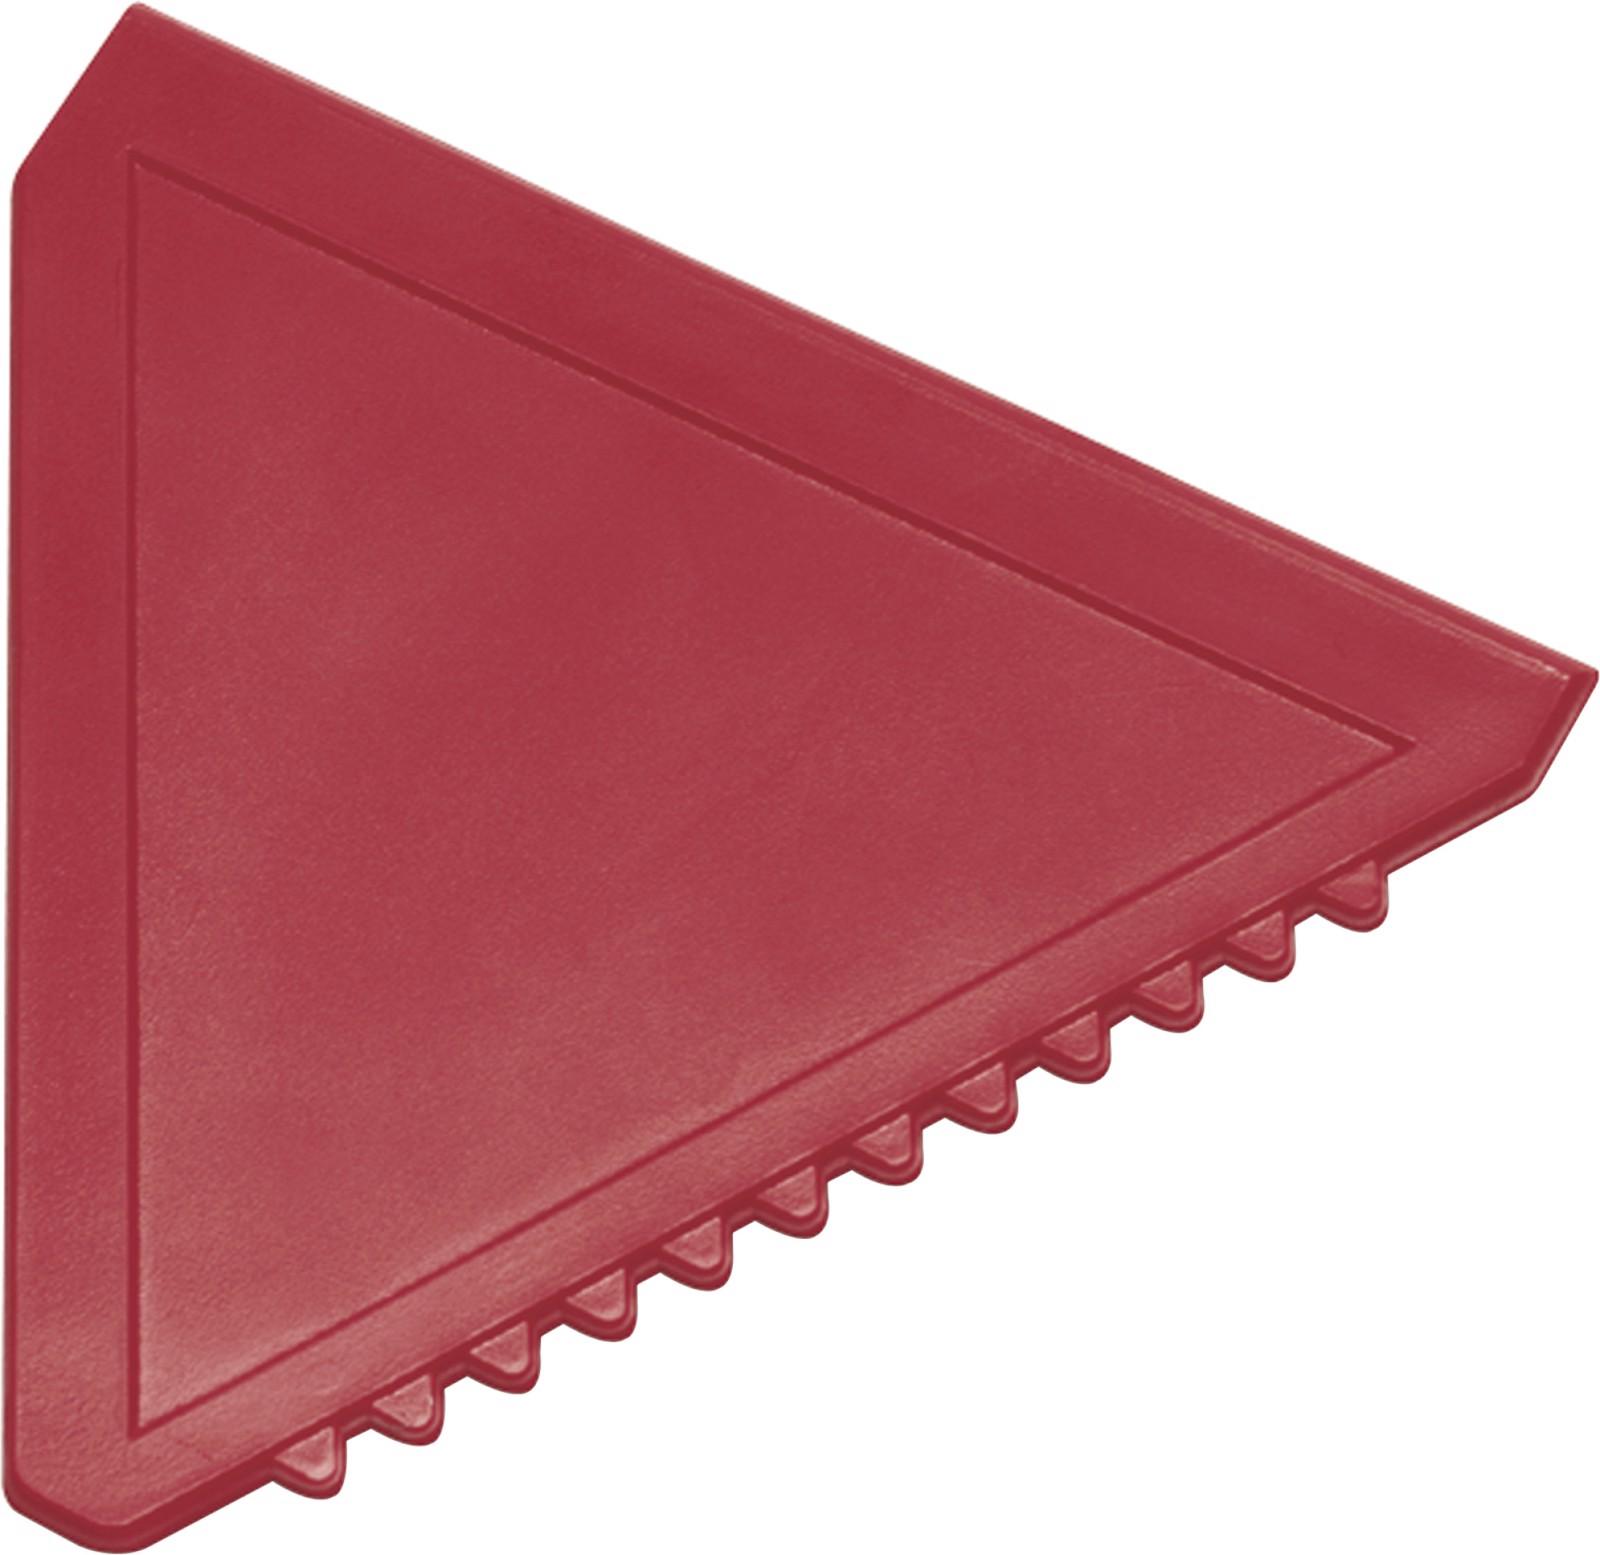 PS ice scraper - Red